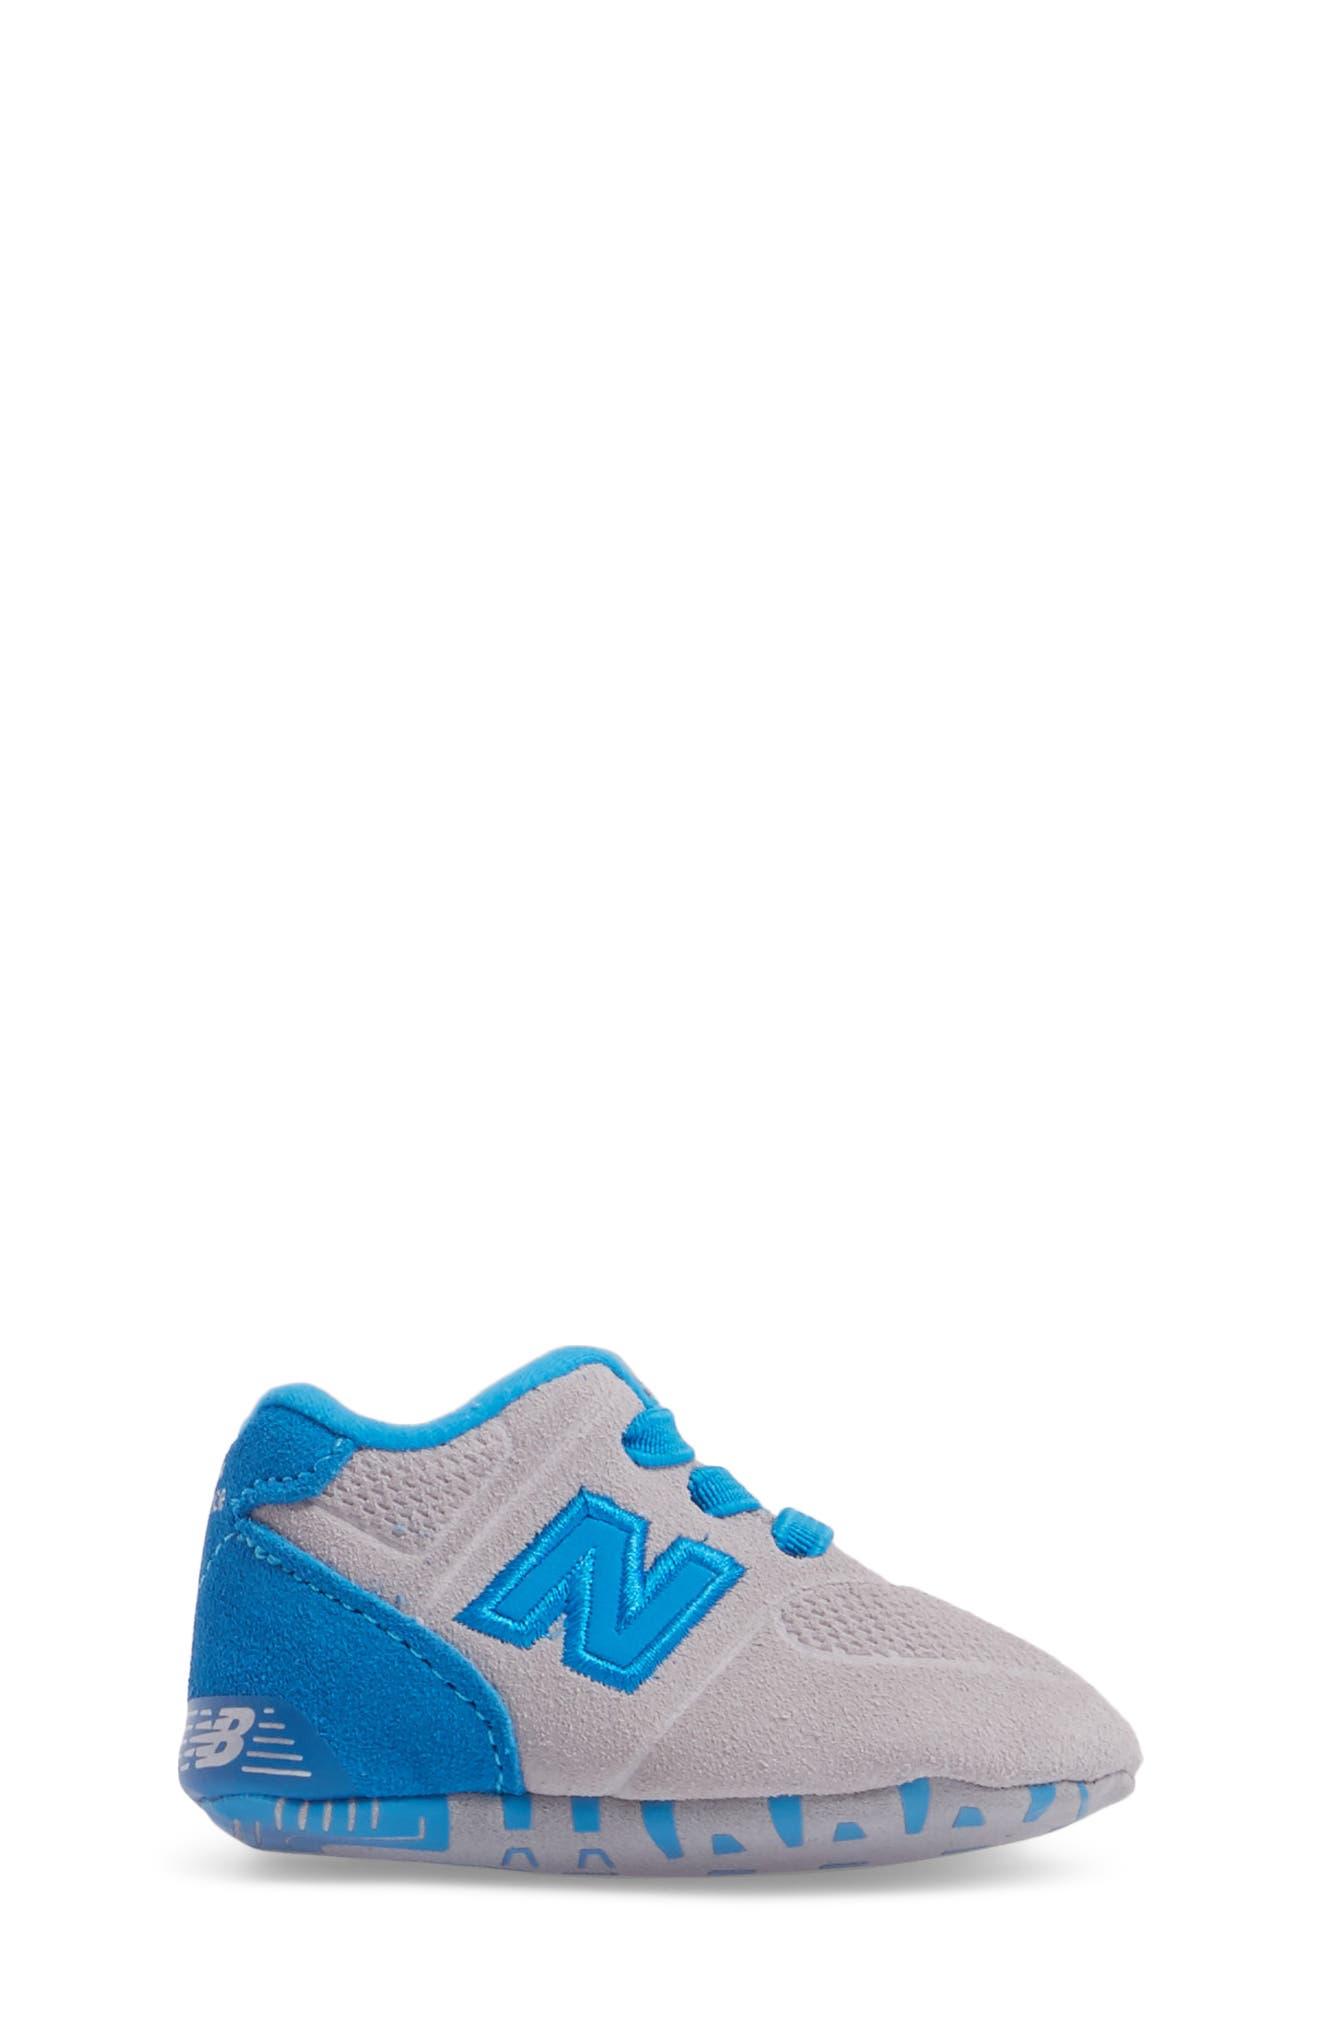 547 Crib Shoe,                             Alternate thumbnail 3, color,                             Blue/ Grey